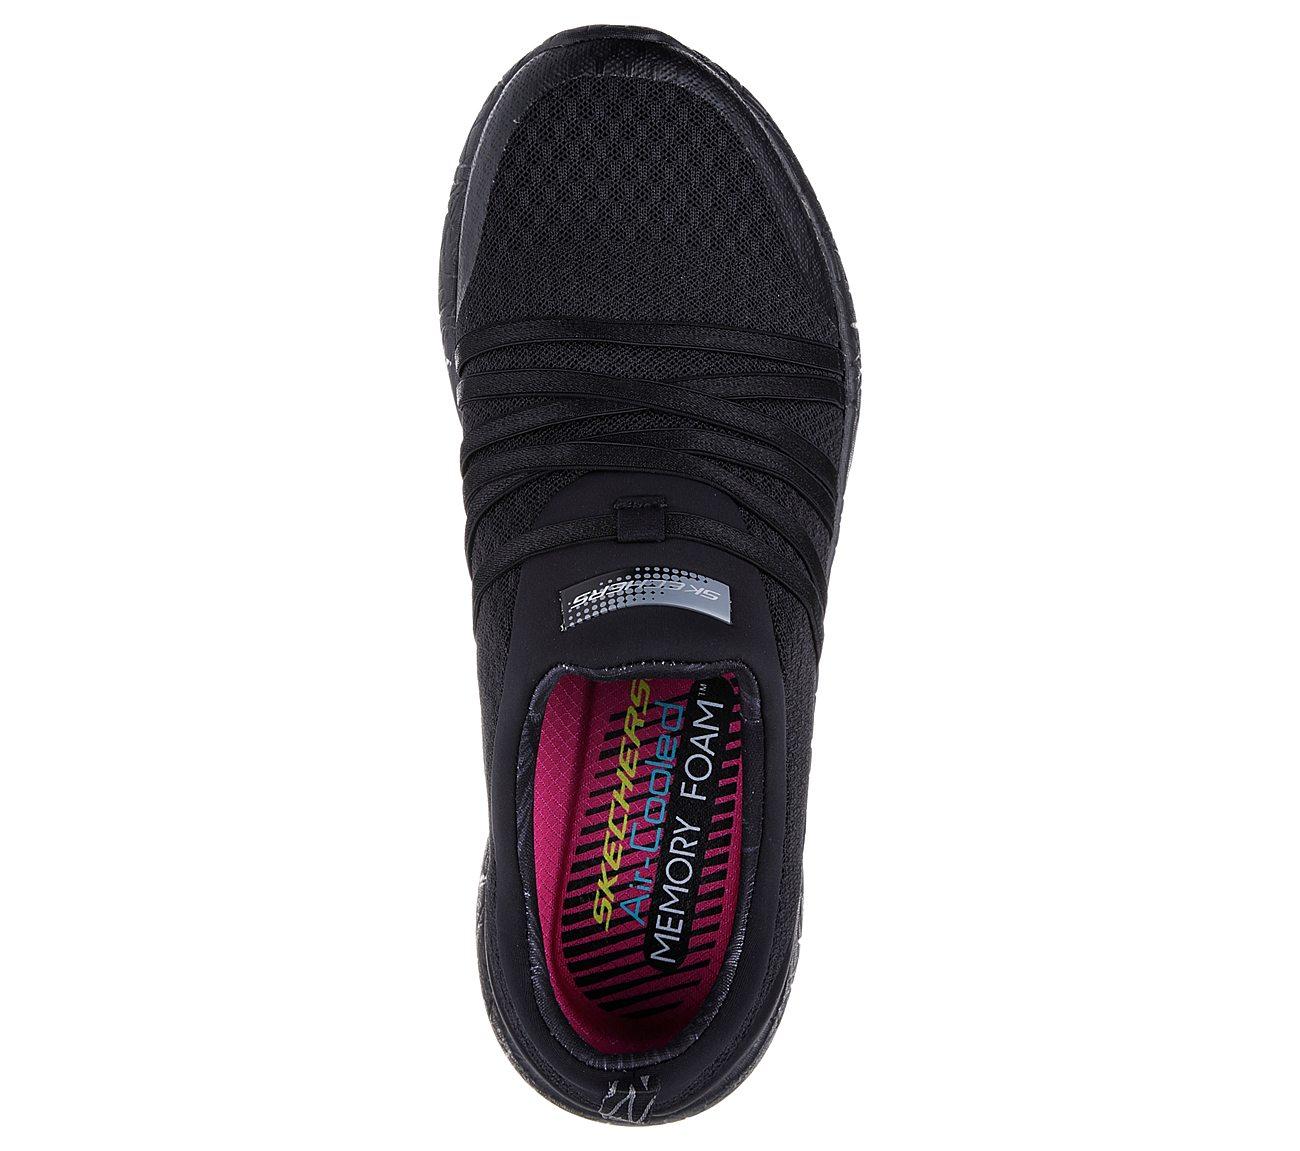 Insignia sobresalir Moderador  Buy SKECHERS Burst - Very Daring Sport Shoes